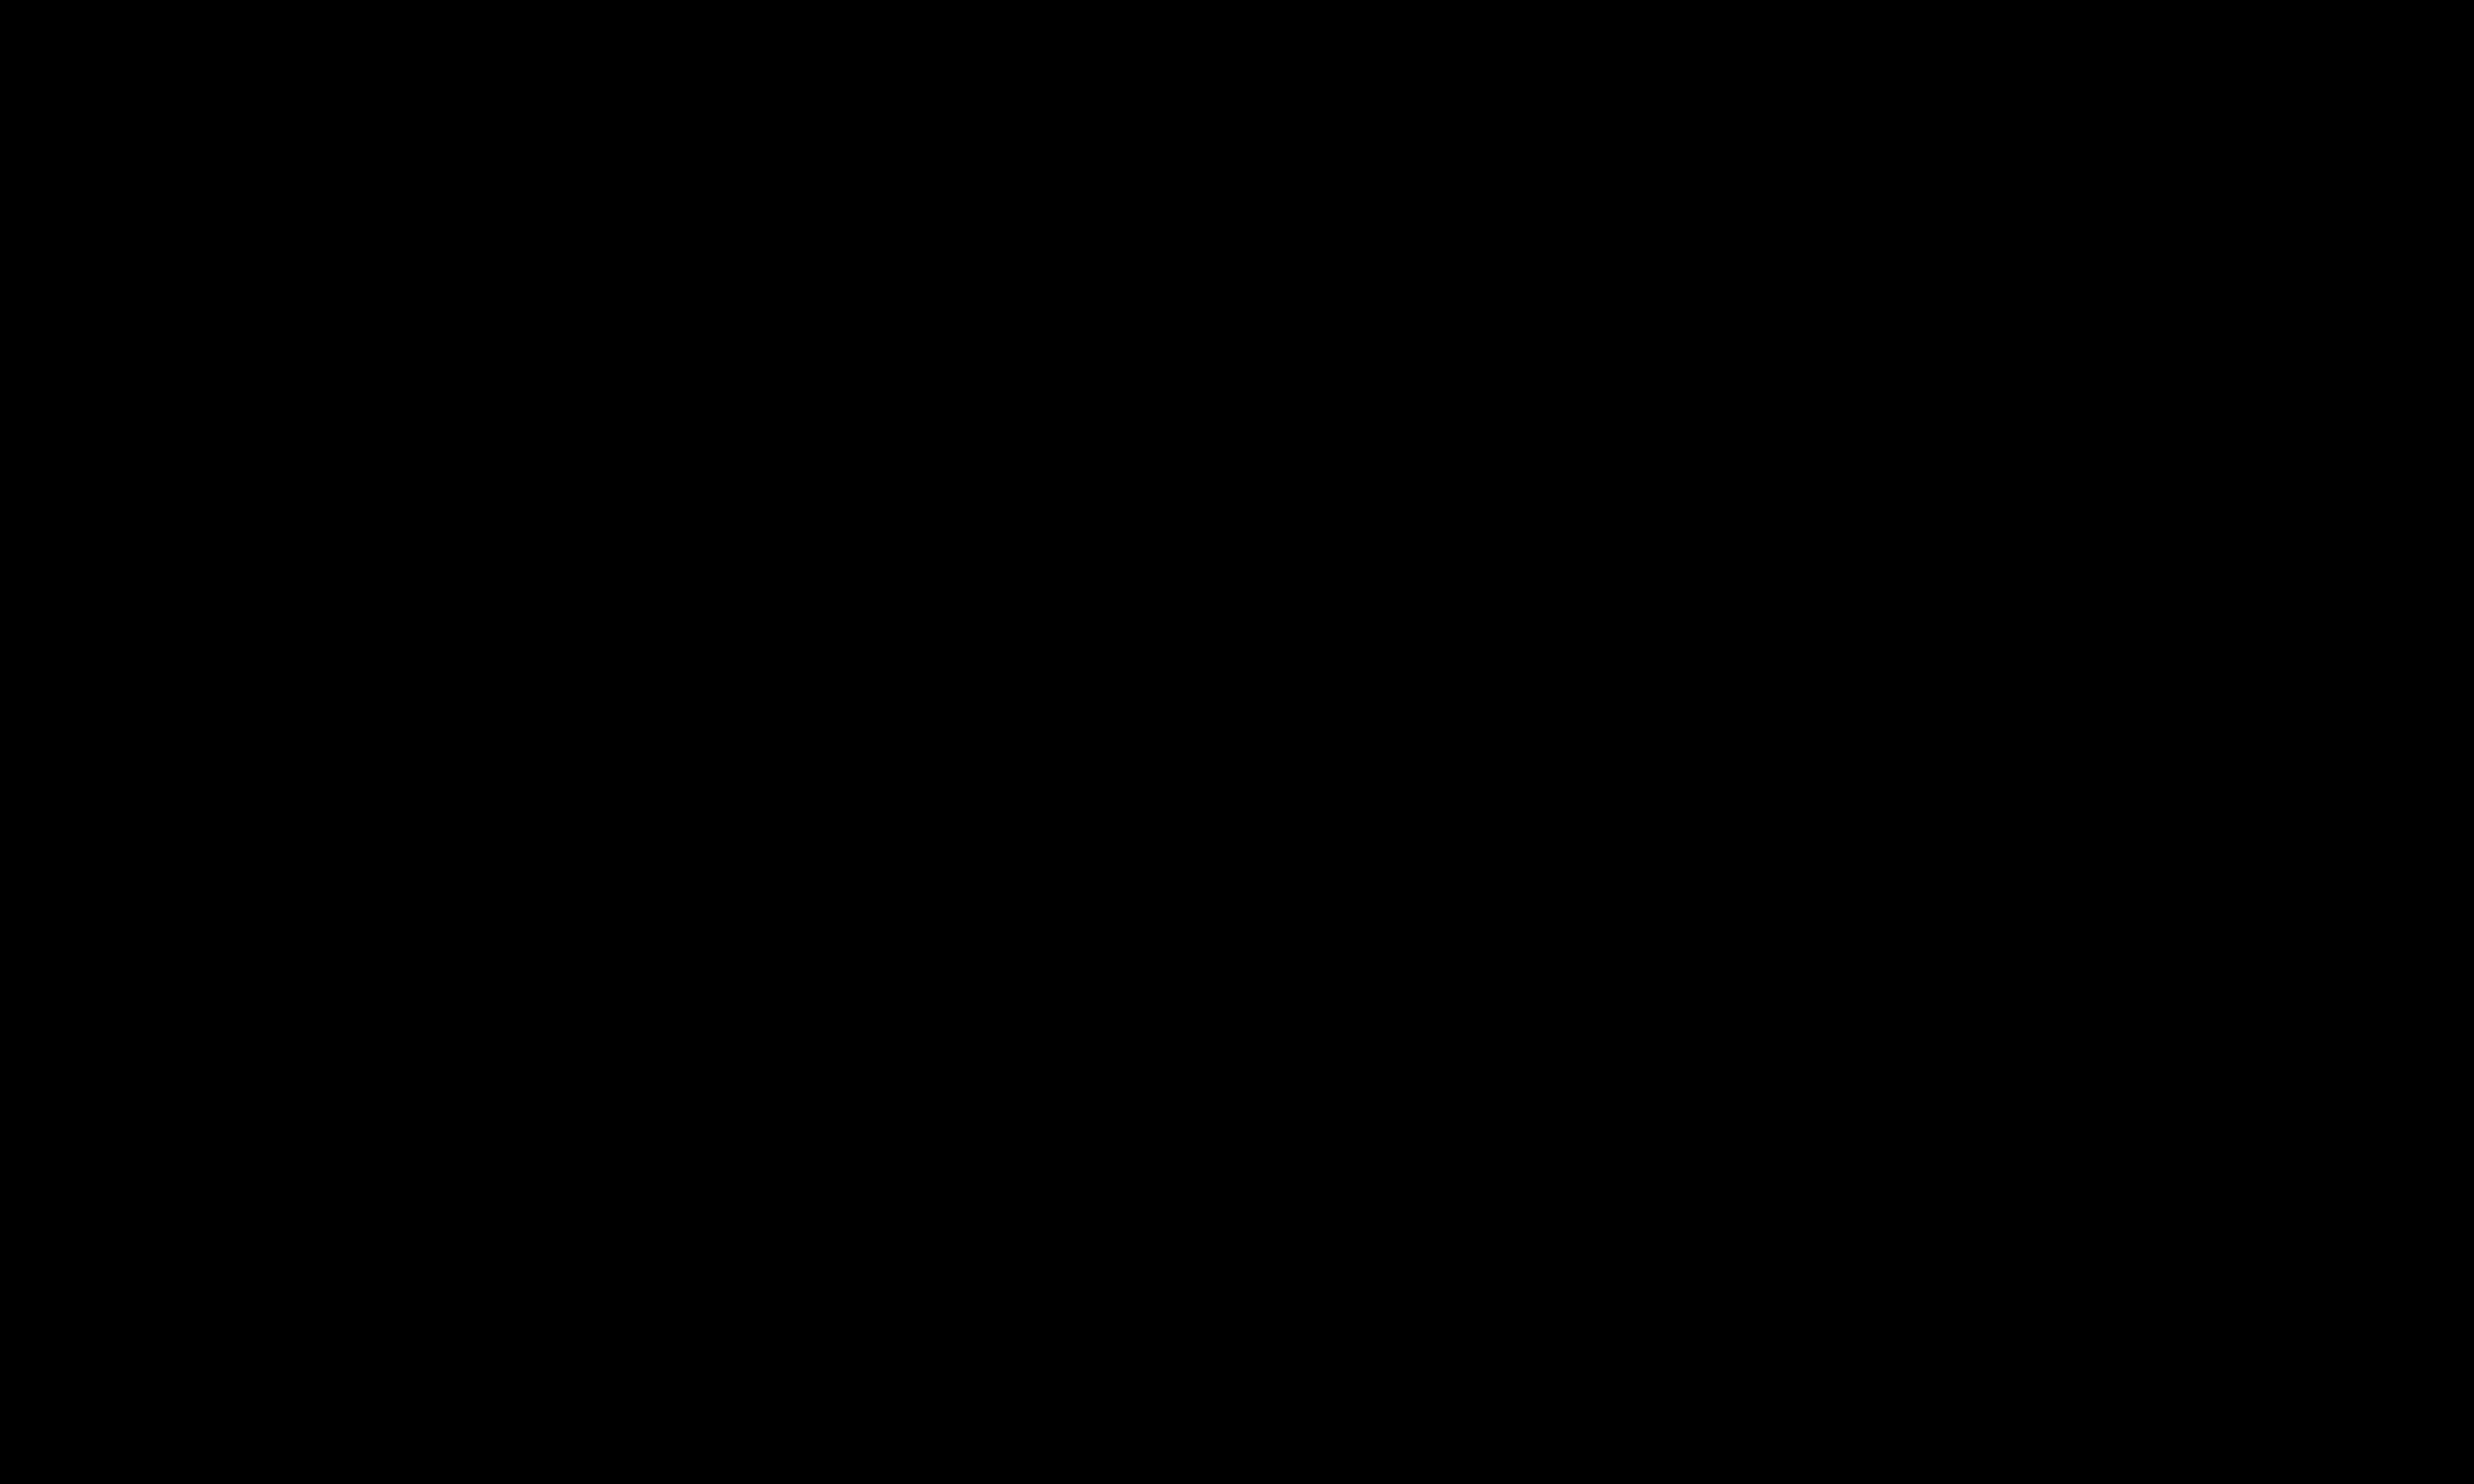 Man draw science formulas